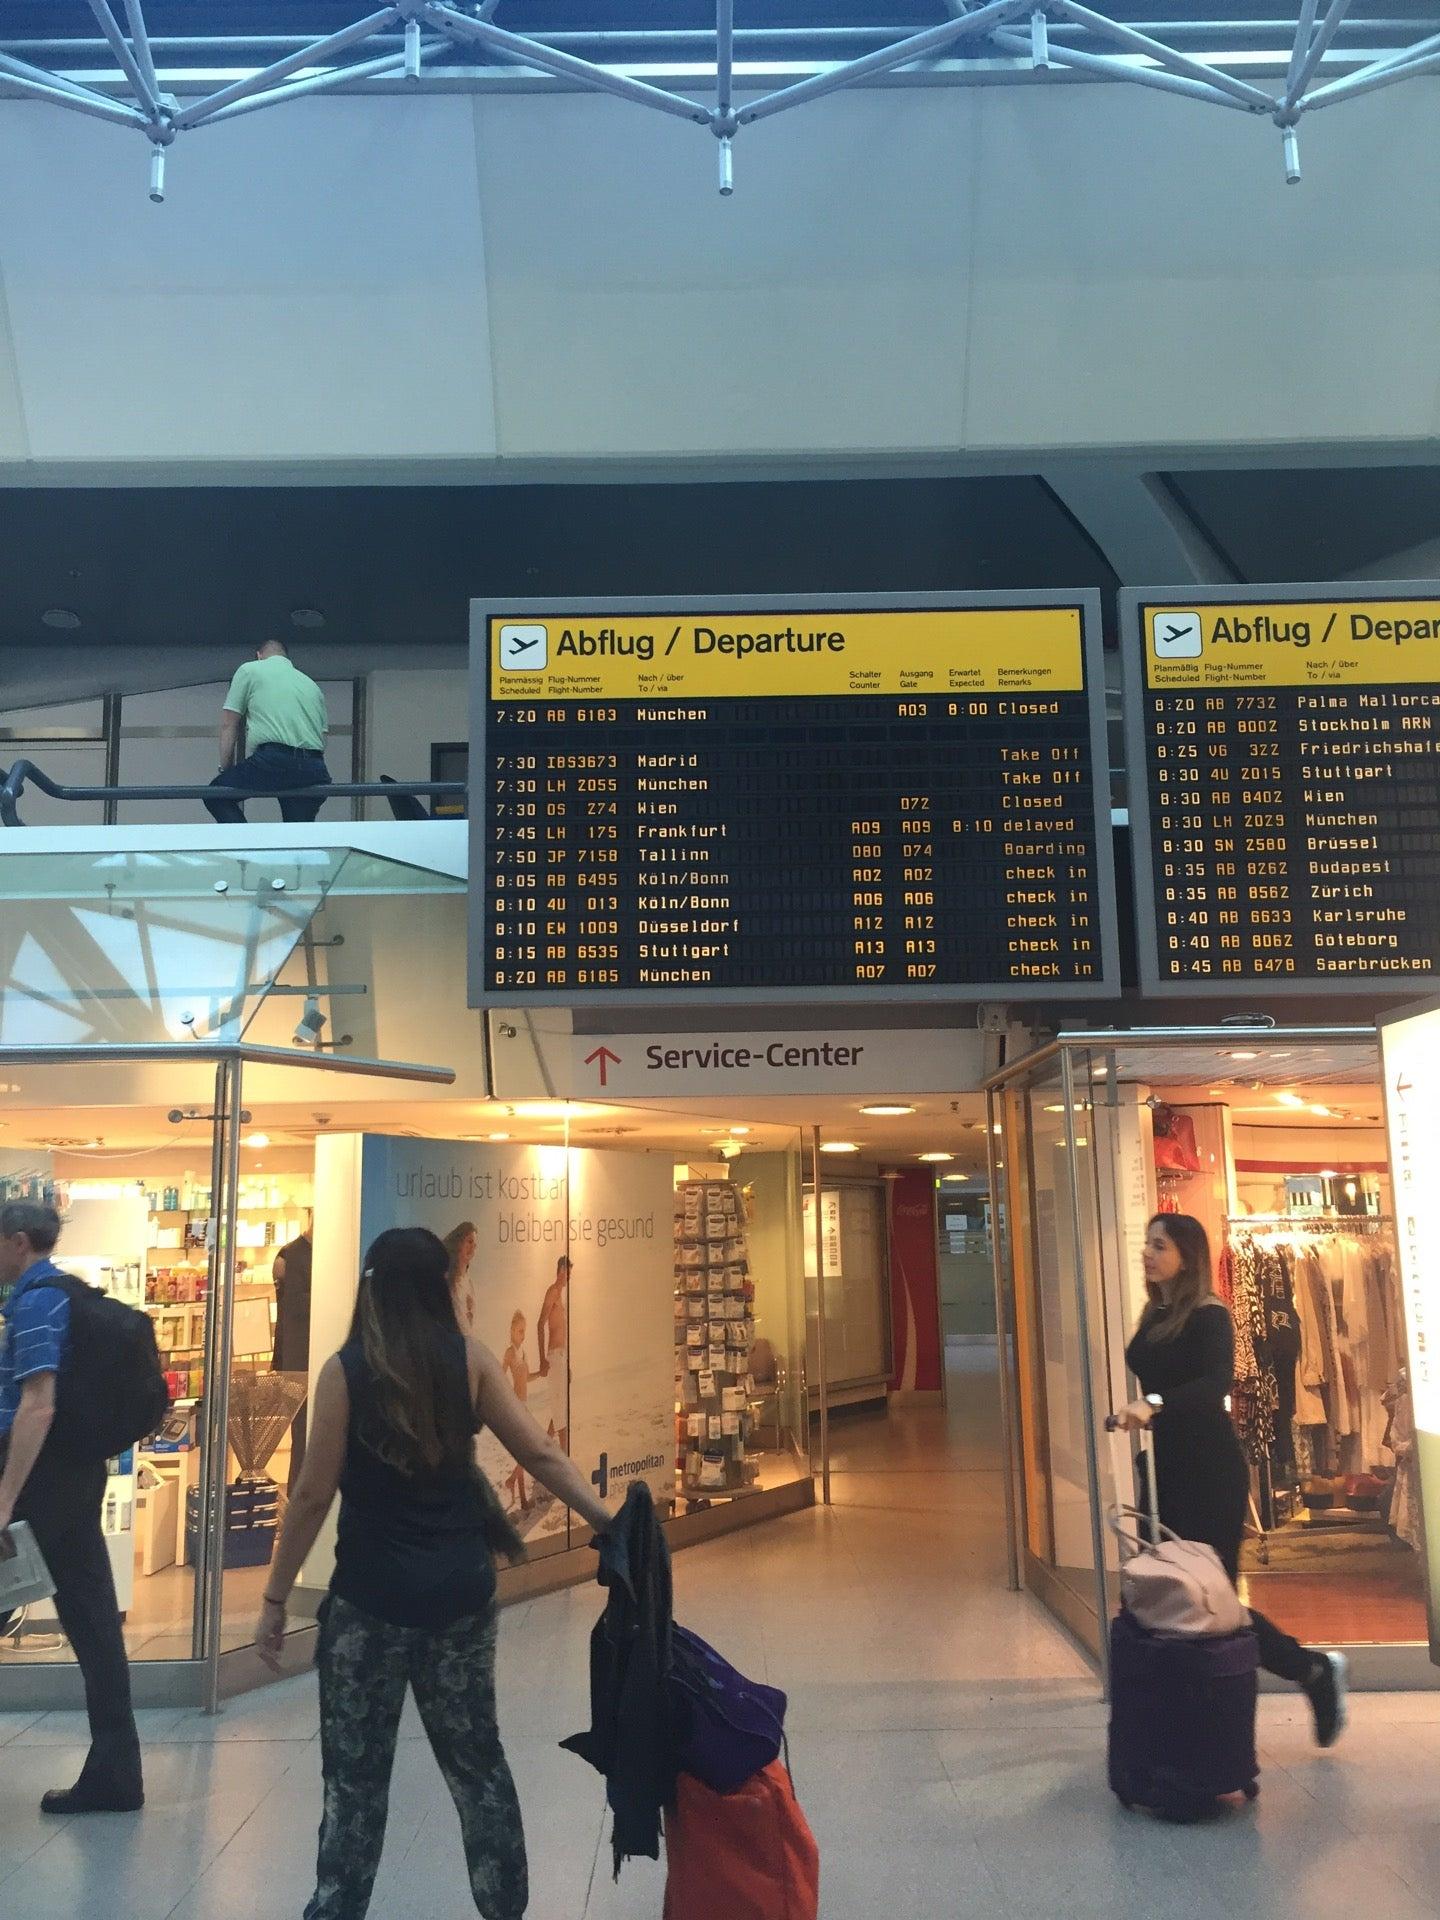 Txl berlin tegel airport flight arrivals flight for Berlin tegel rent a car